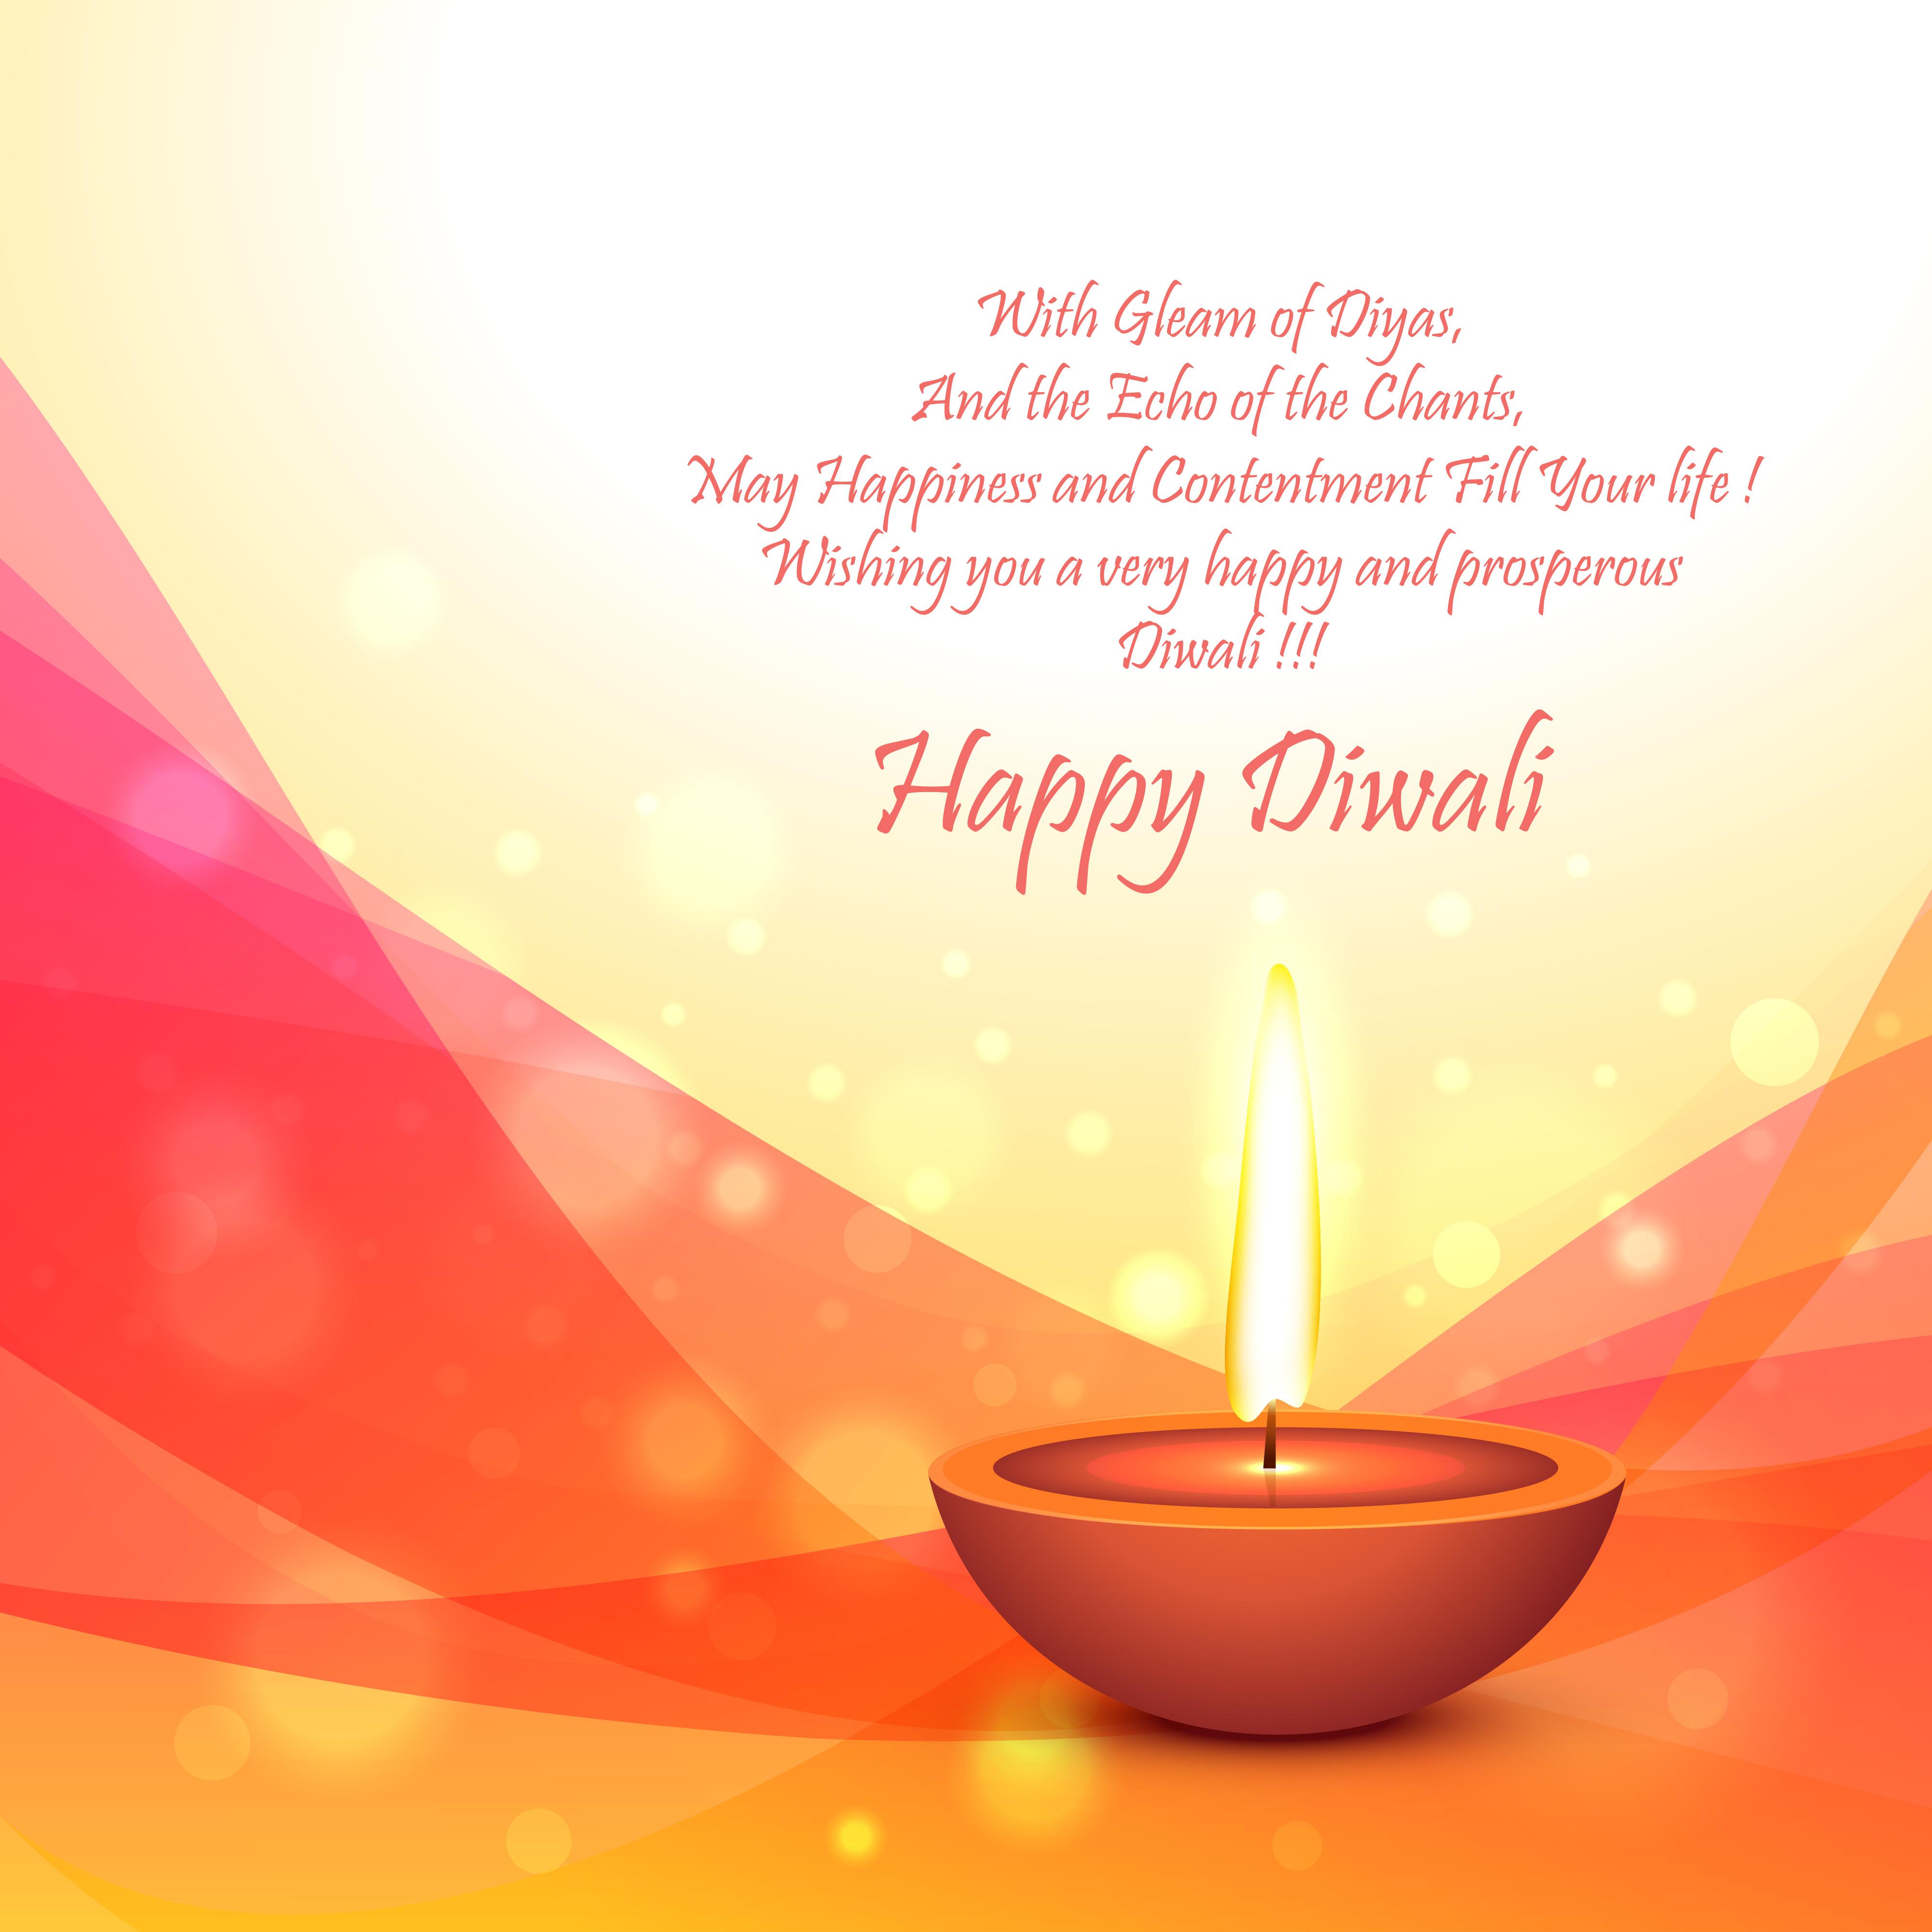 diwali festival card template - Download Free Vector Art, Stock ...